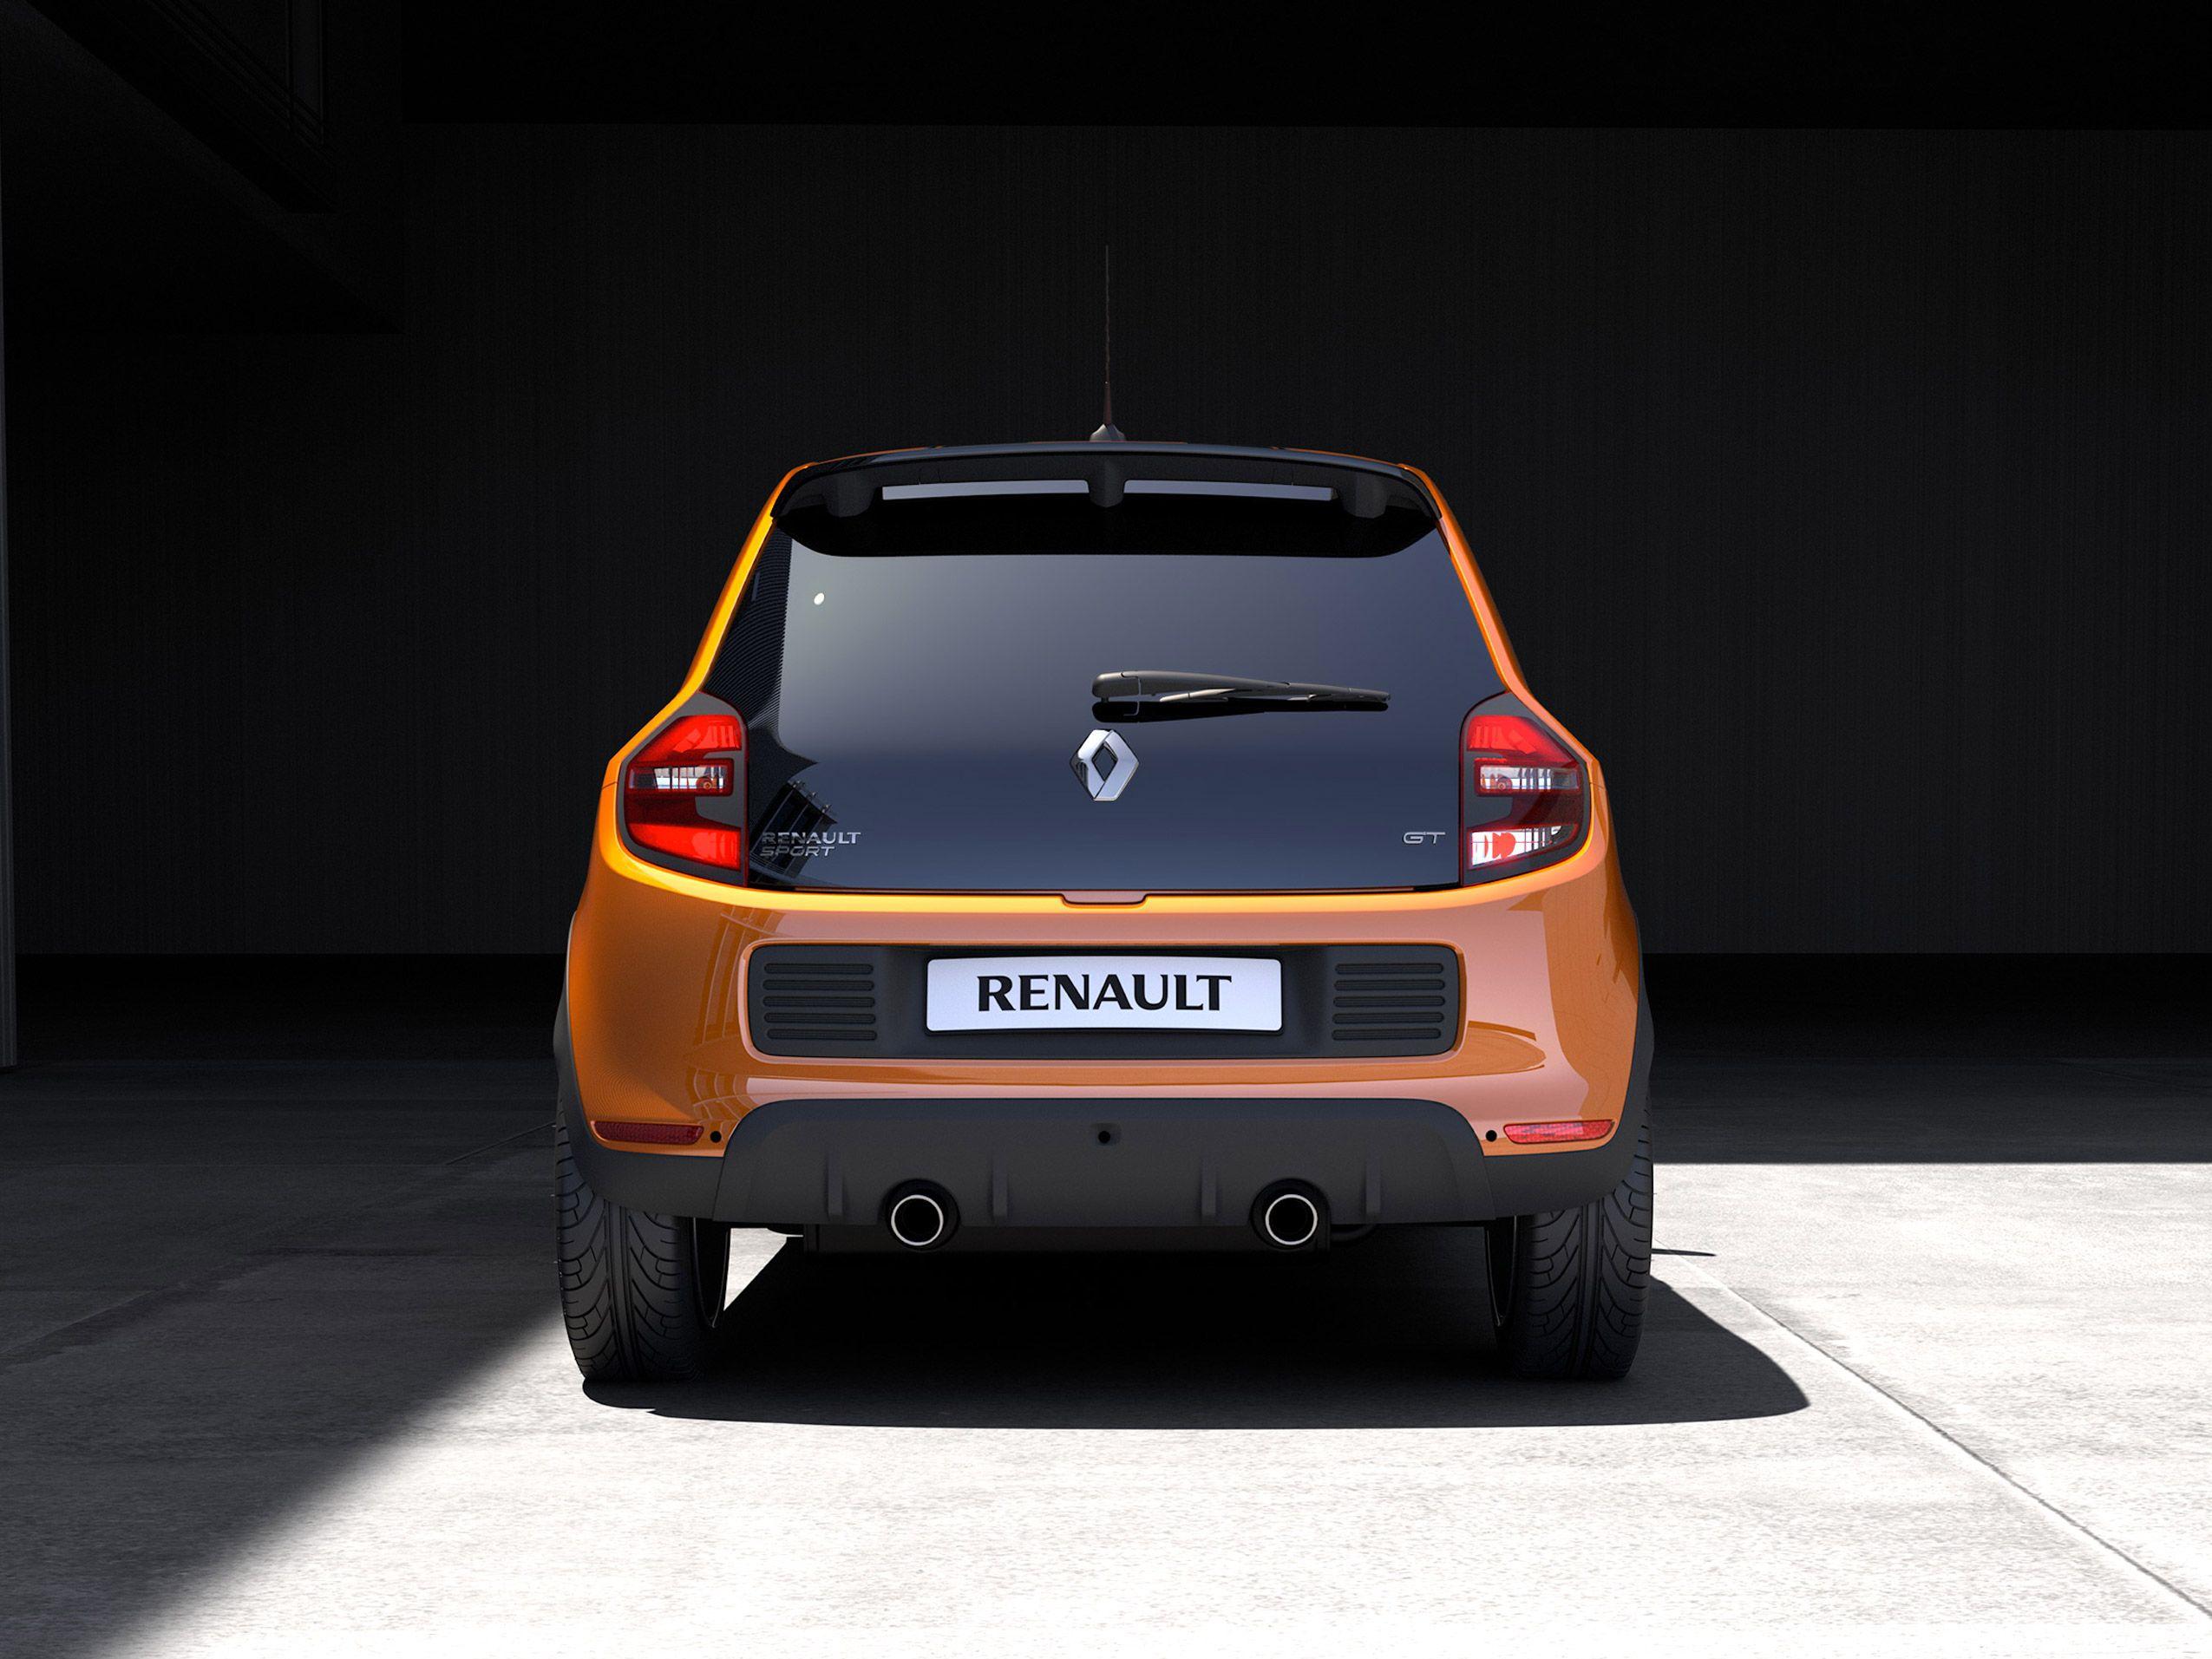 The Twingo Gt C Renault Design Automobiles Of The Future